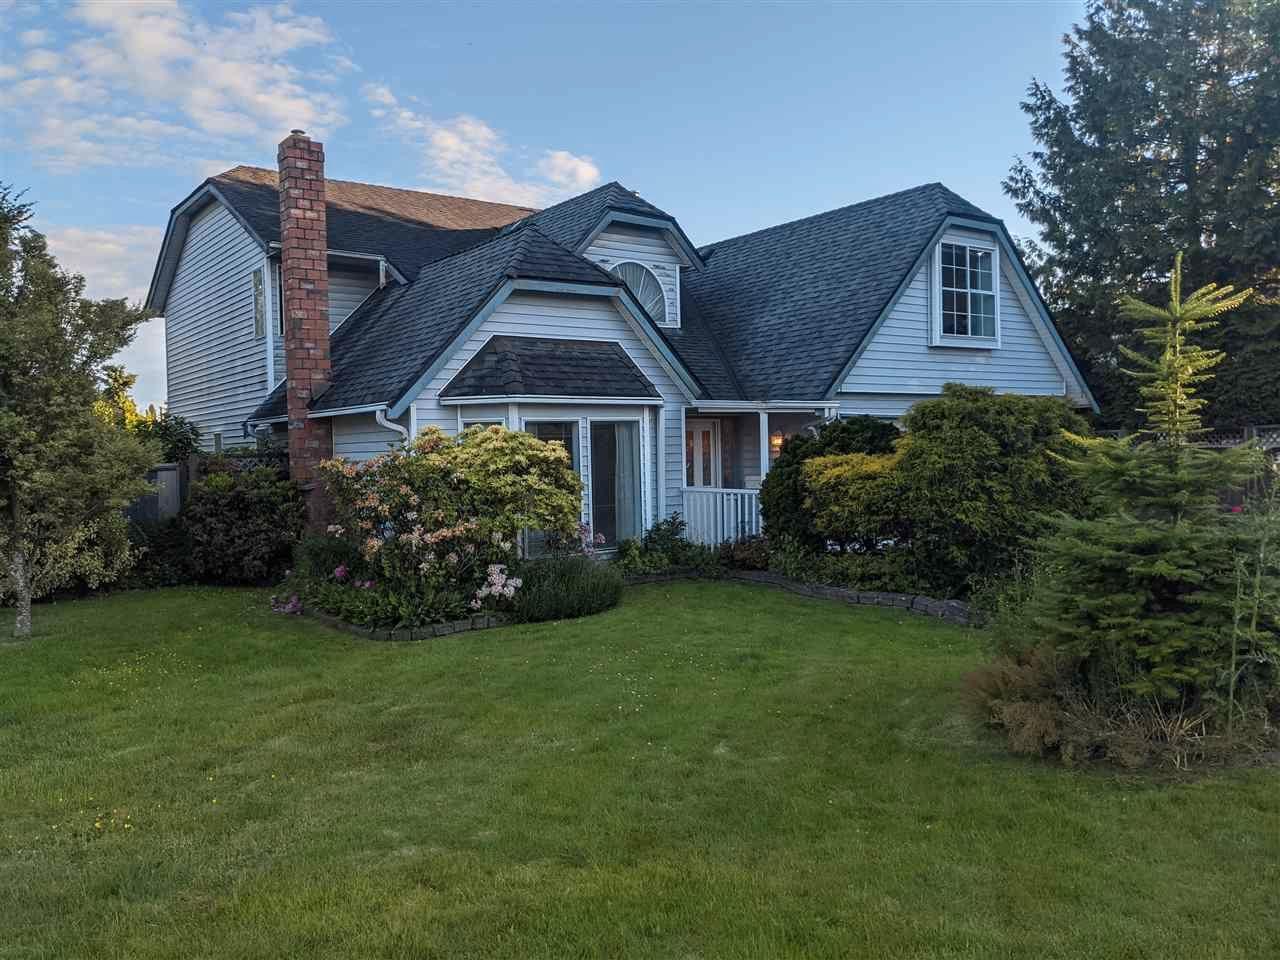 Main Photo: 5544 47A AVENUE in Delta: Delta Manor House for sale (Ladner)  : MLS®# R2590792